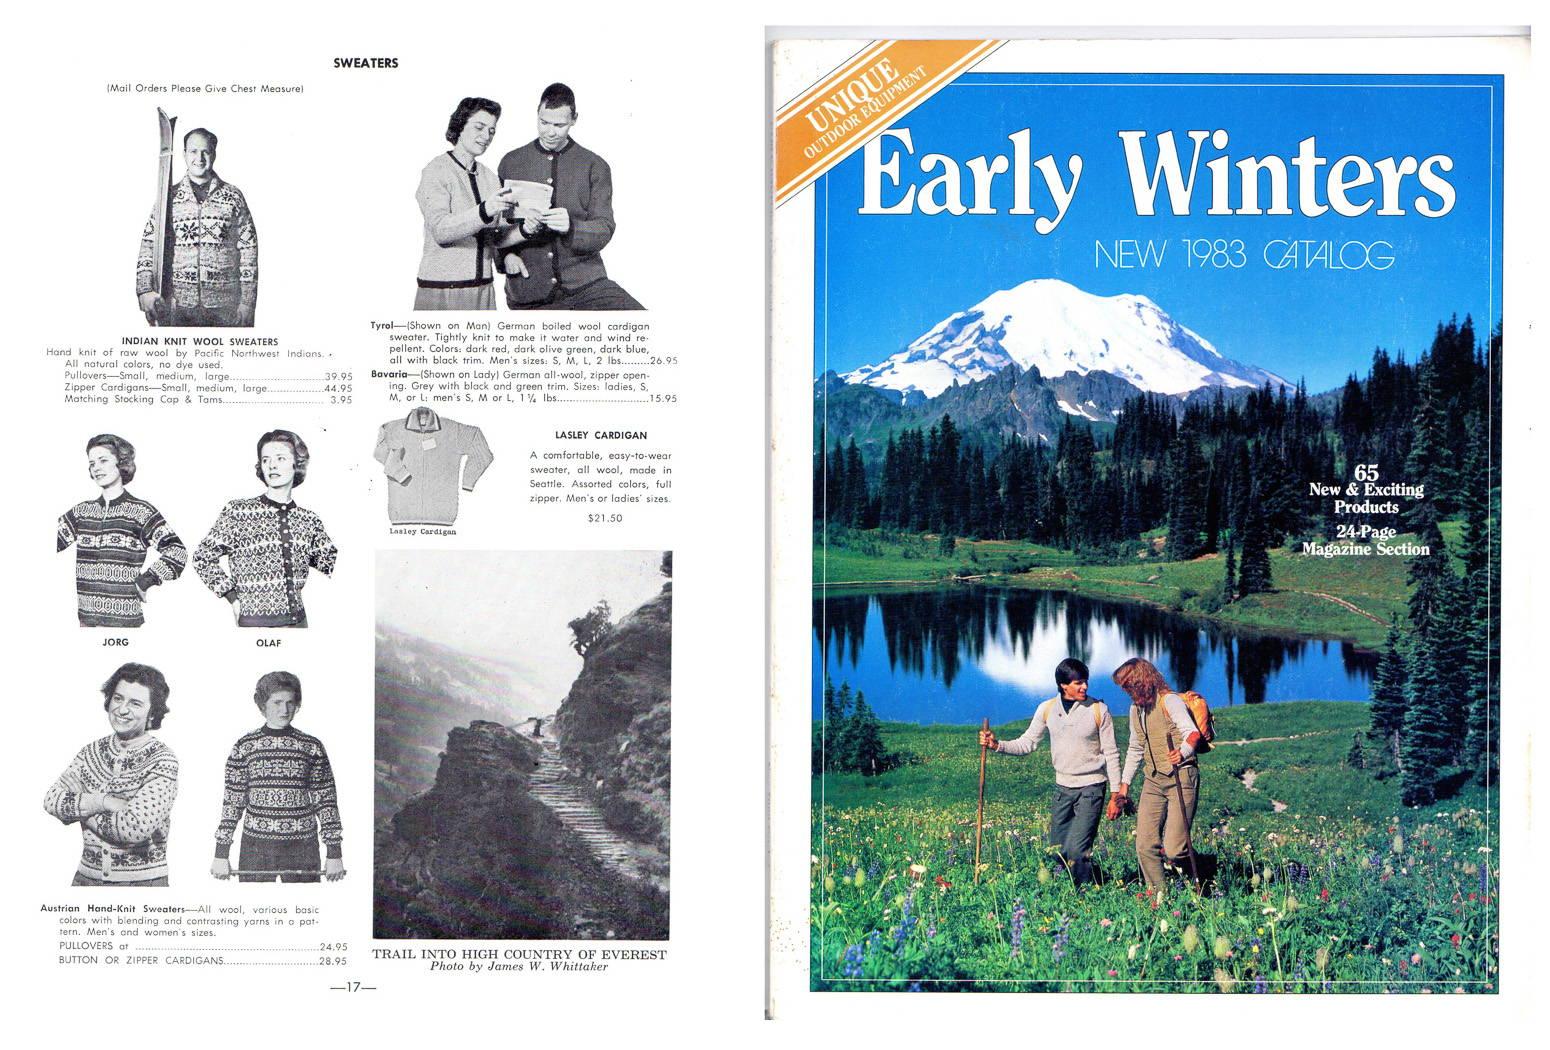 REI Catalog 1964, p.17; Early Winters Catalog 1983